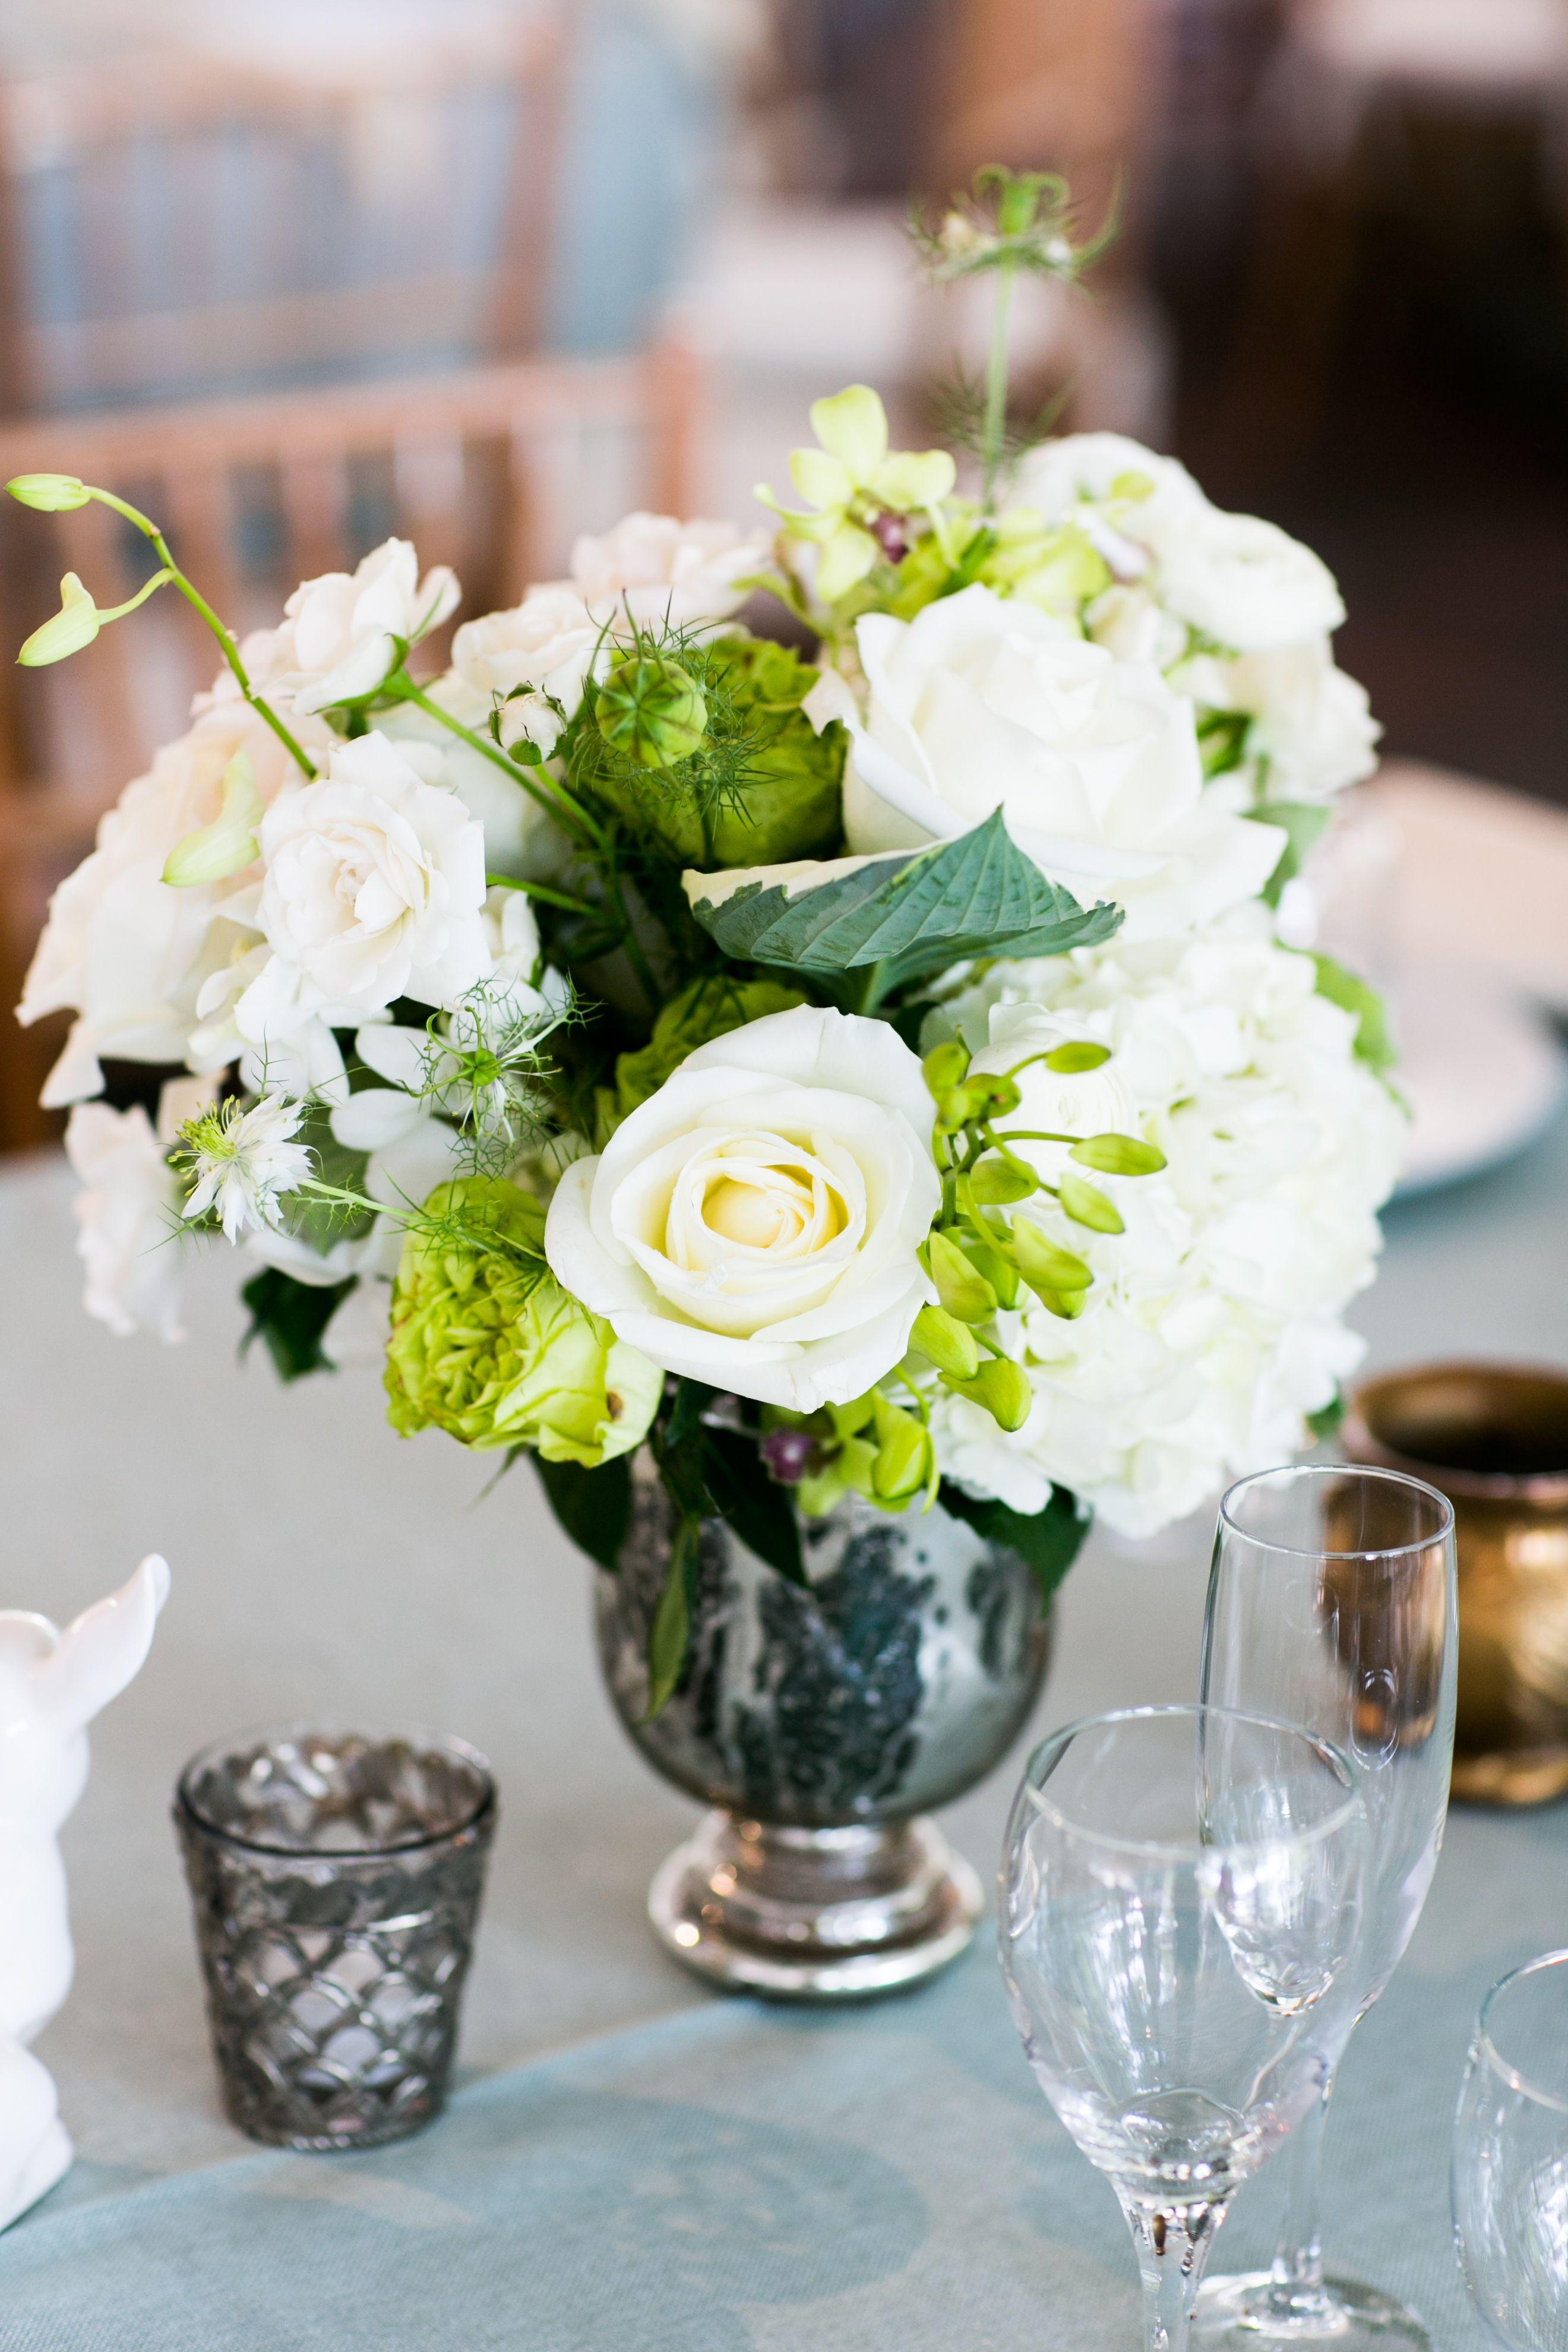 Classic White Rose Centerpiece In Mercury Glass Vase Wedding Flowers